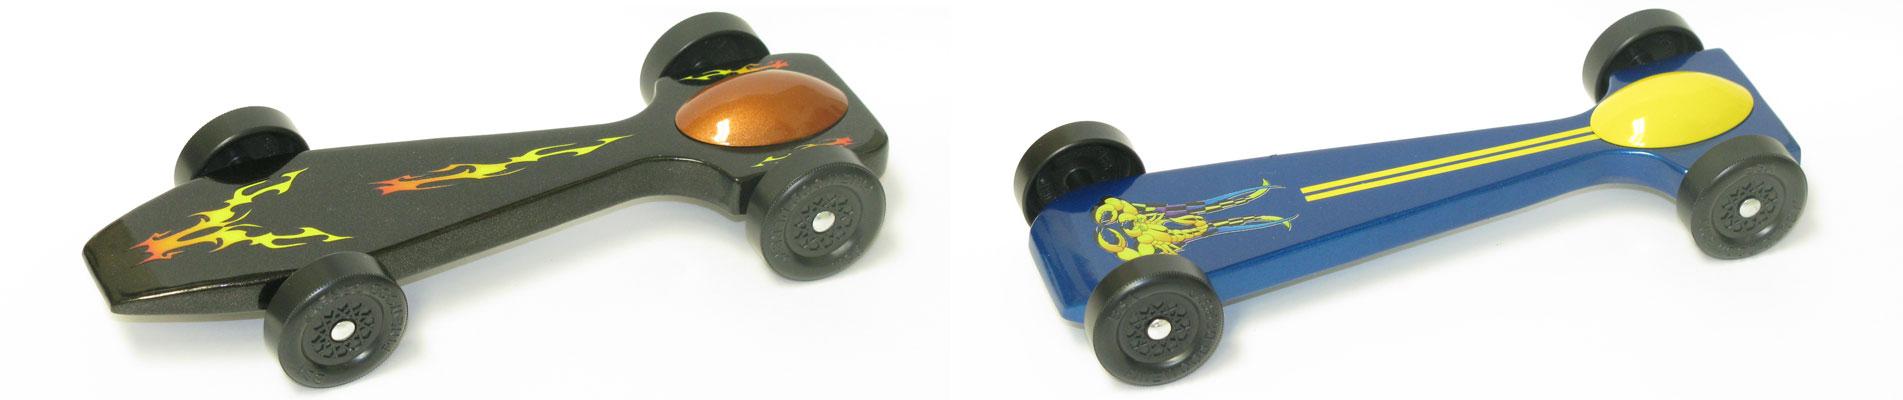 SuperCude Pinewood Derby Car Kit